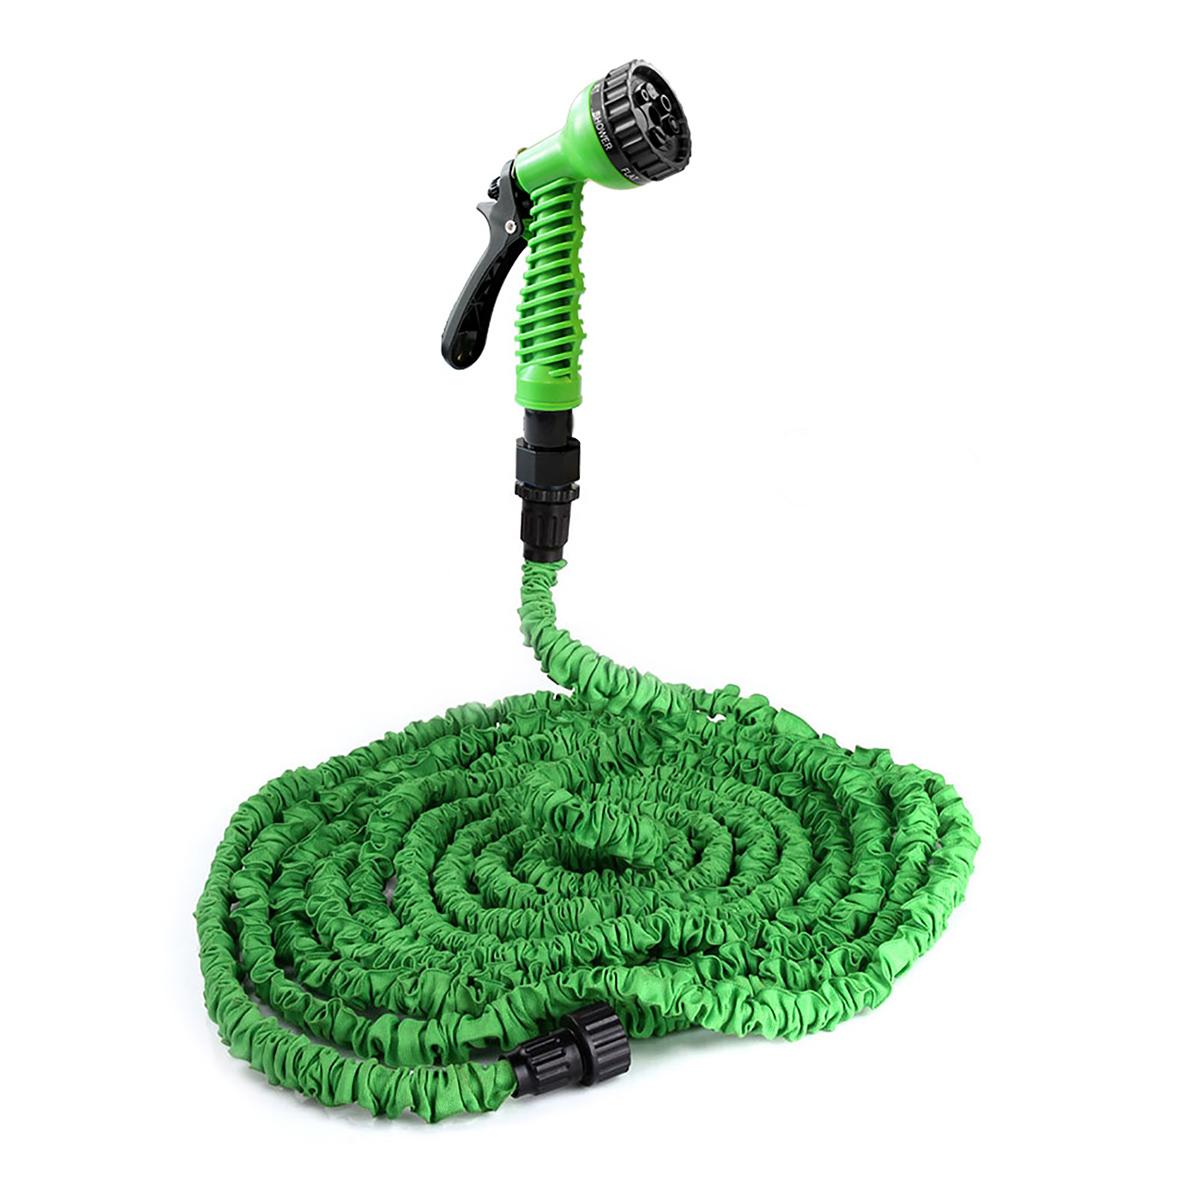 flexibler wasserschlauch 30m 15m 7 5m gartenschlauch flexi hose magic schlauch ebay. Black Bedroom Furniture Sets. Home Design Ideas